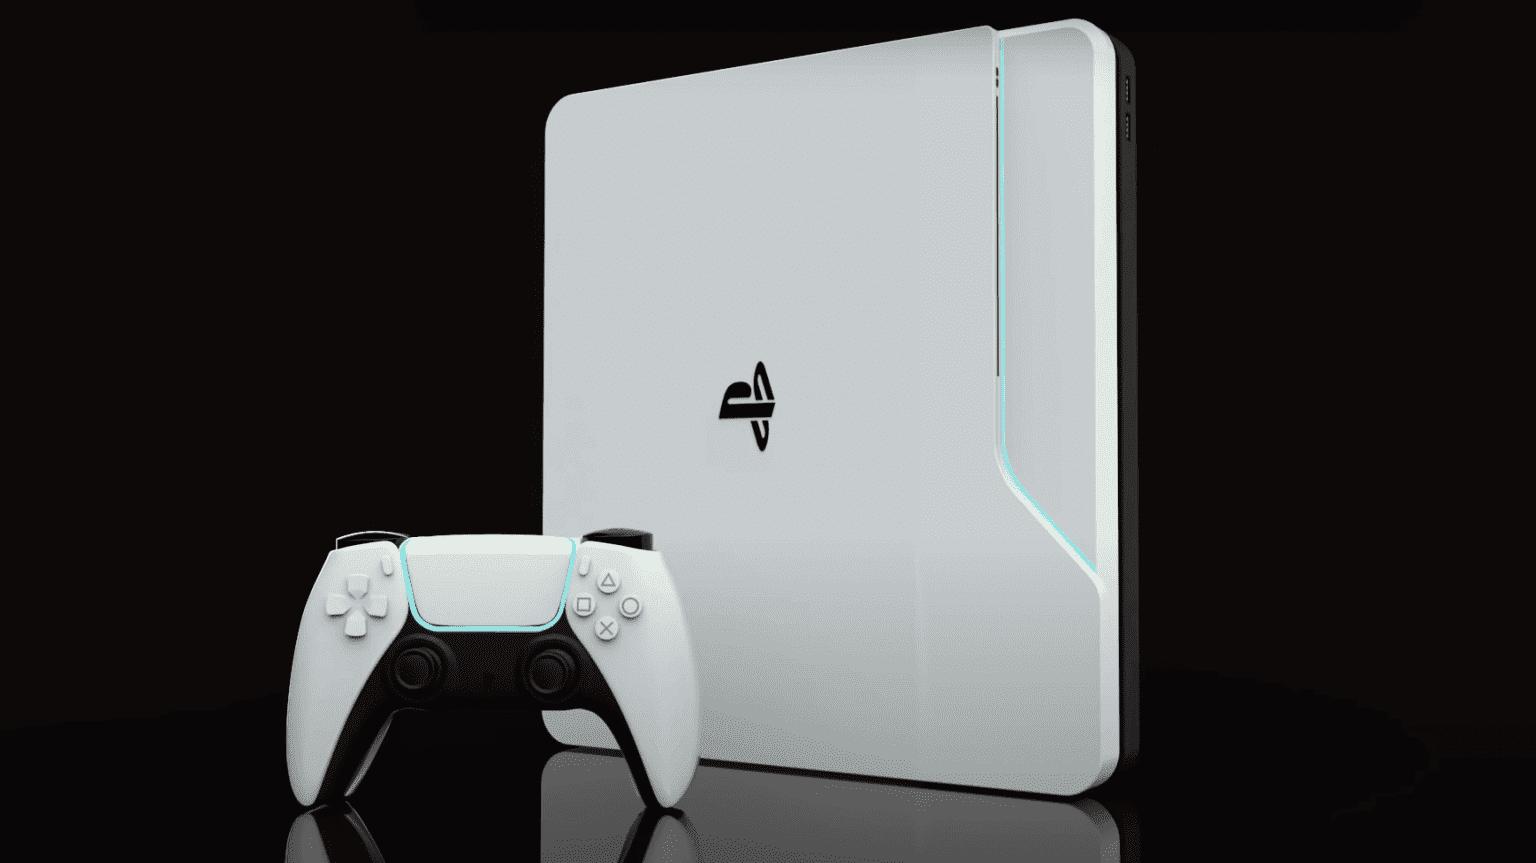 SONY PS5: إصدار مجموعة متنوعة من ألعاب